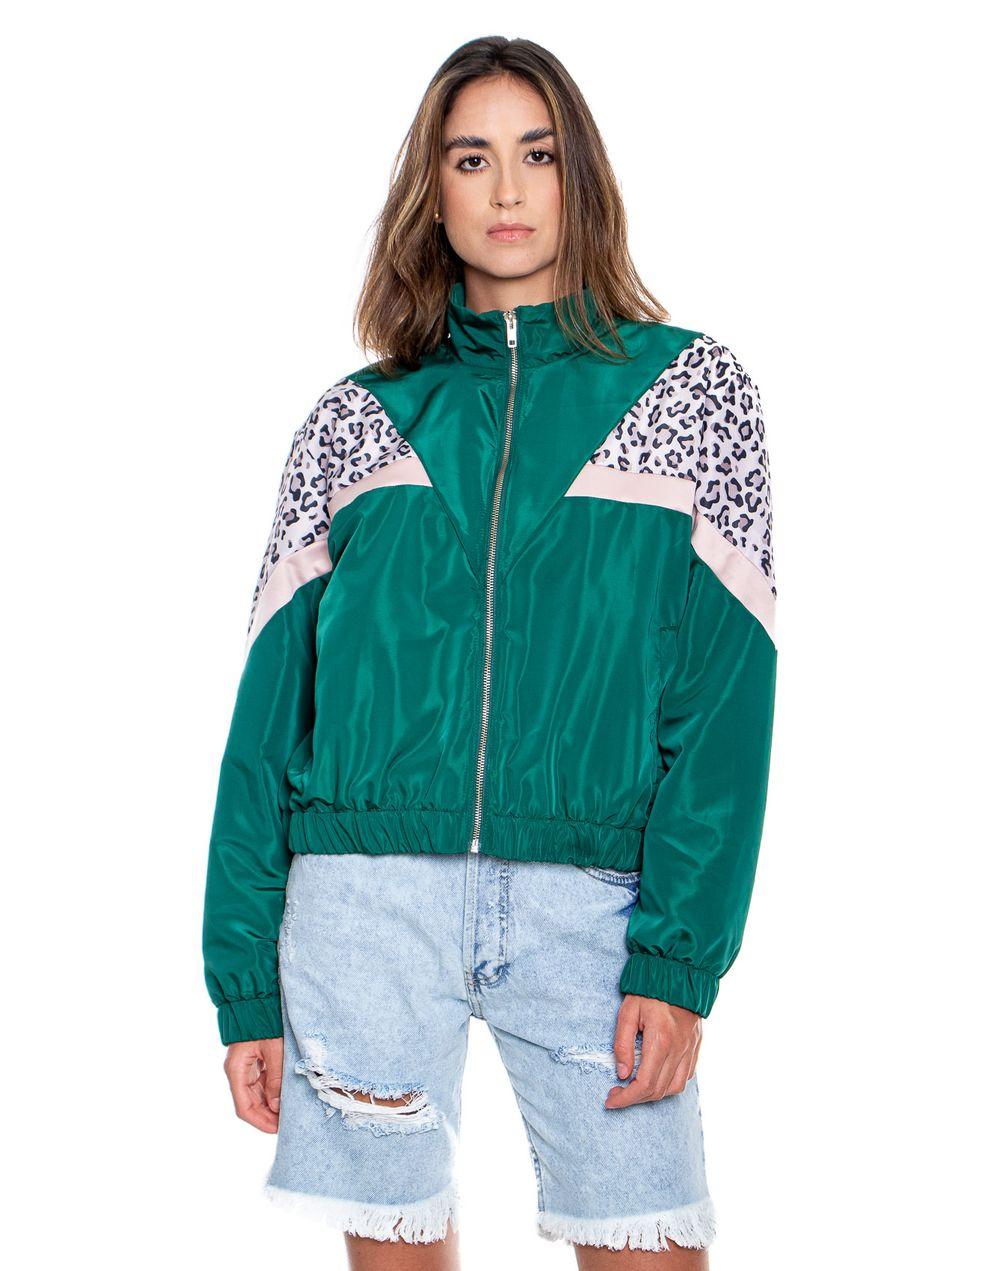 chaqueta-114508-verde-1.jpg